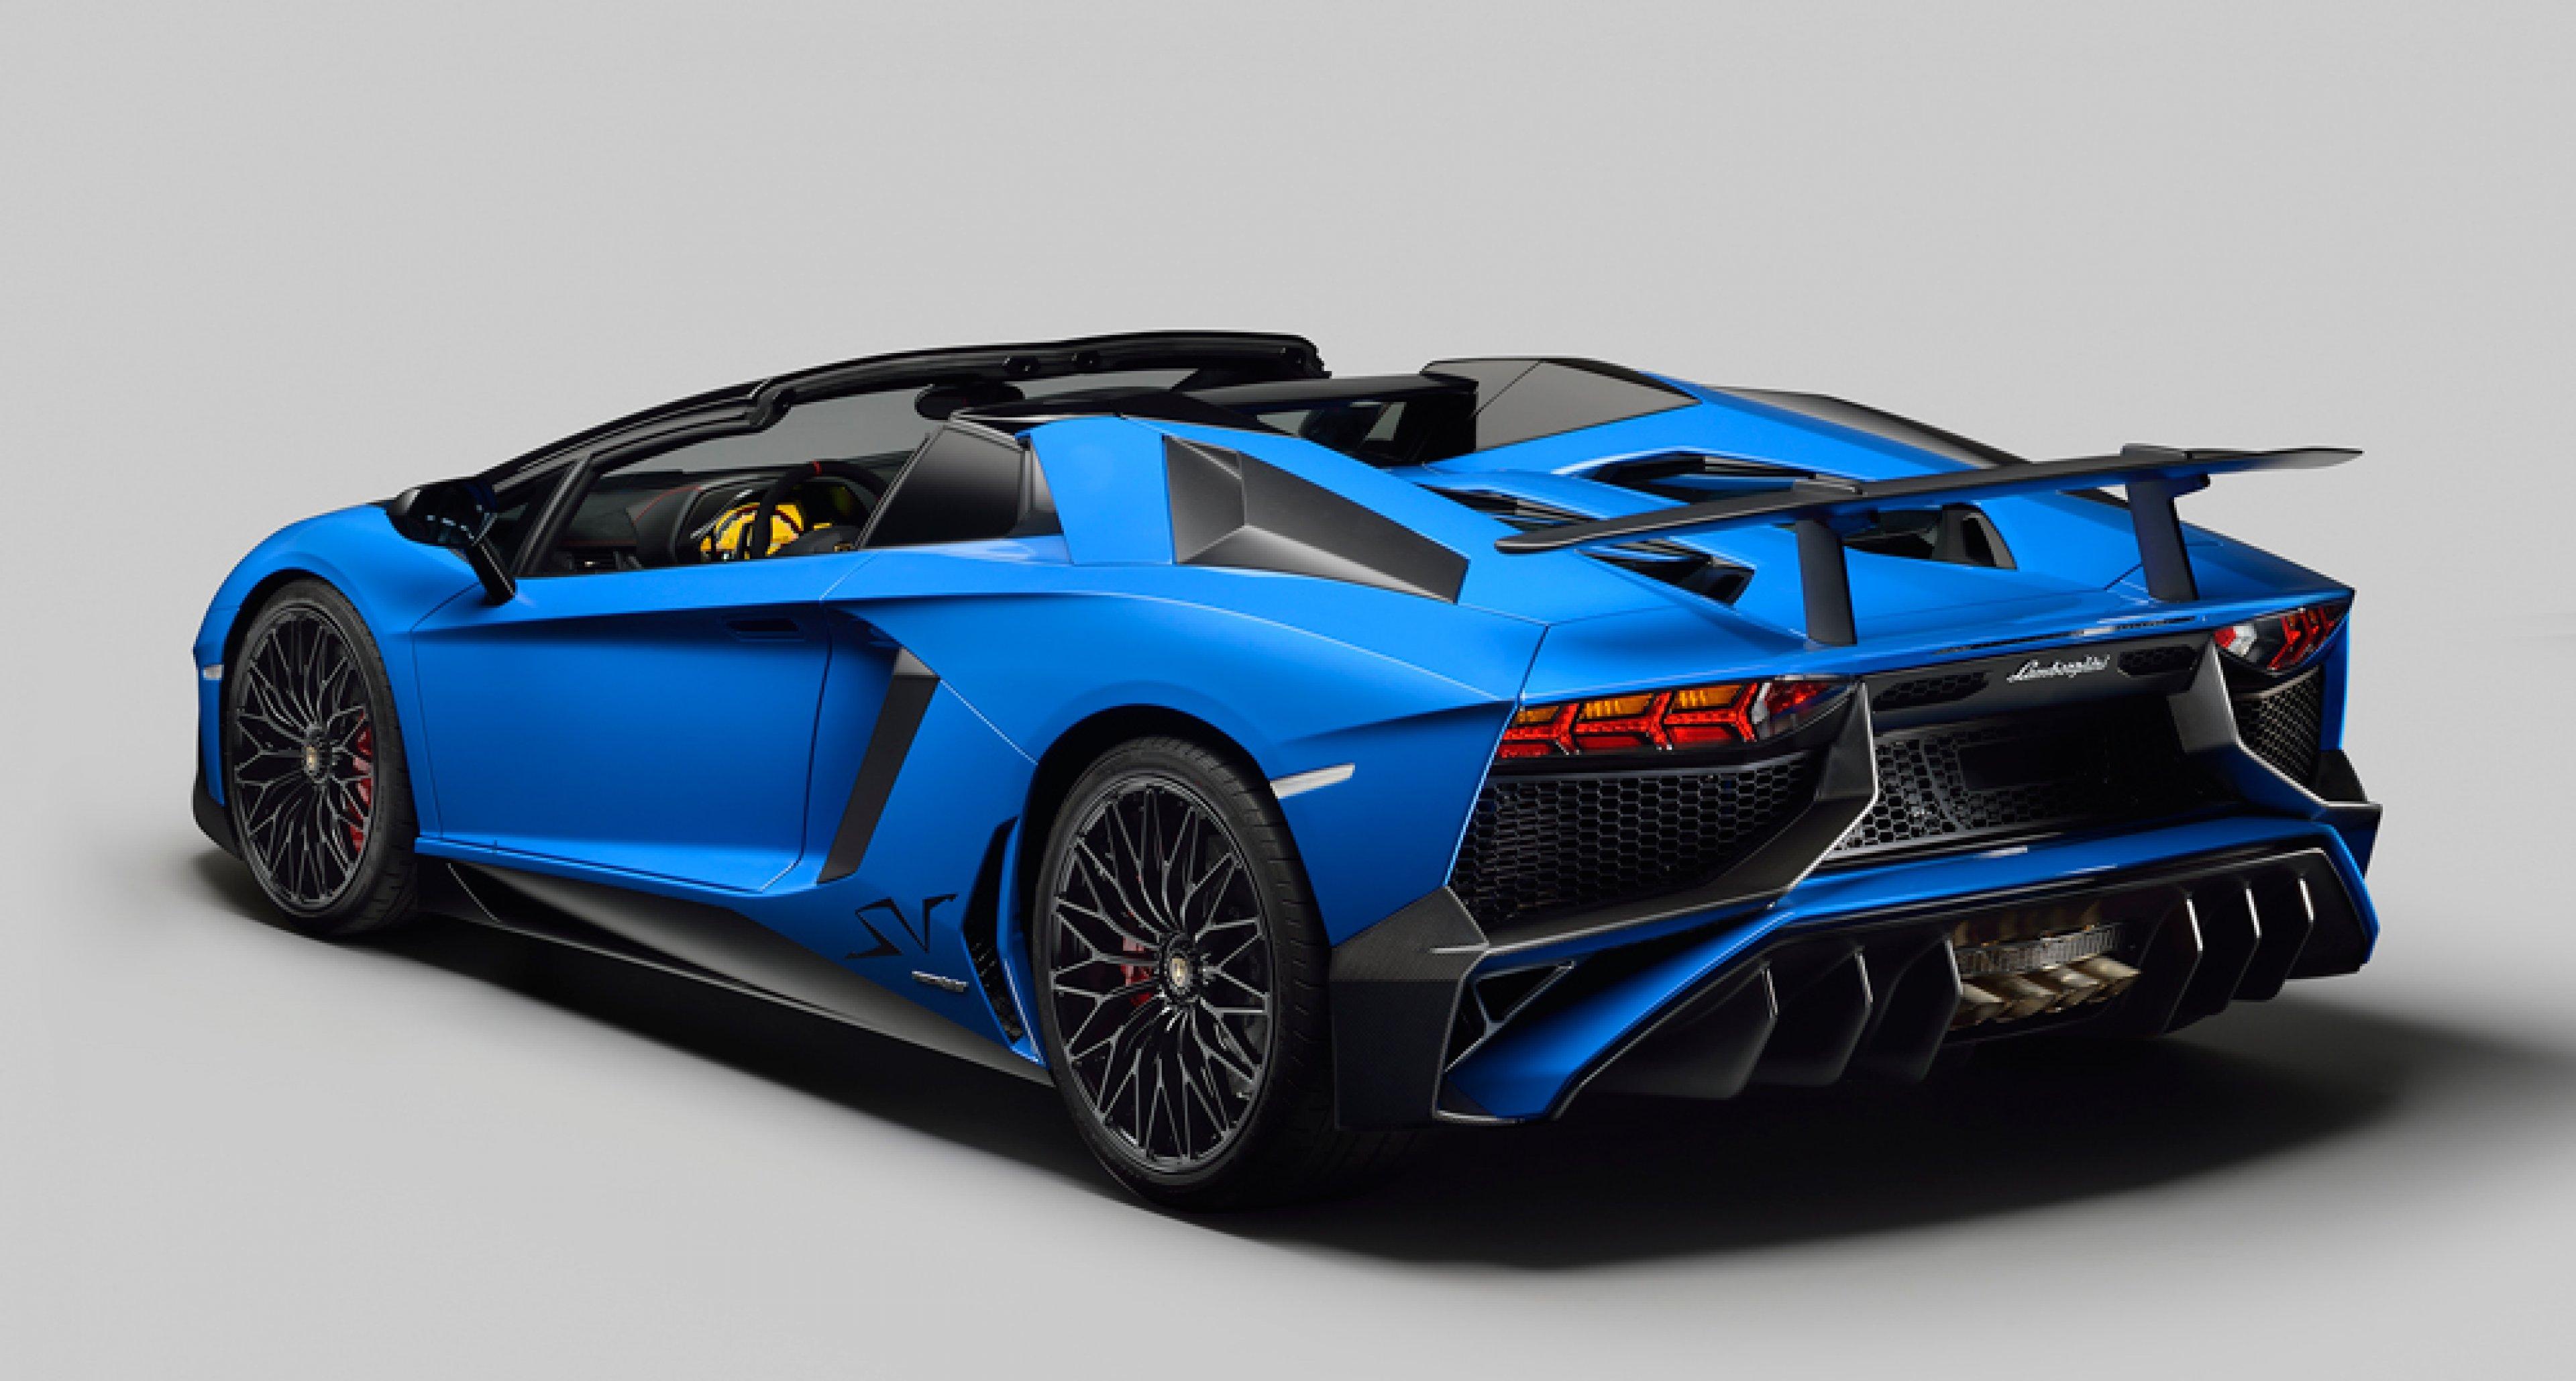 at 217mph – the new Lamborghini Aventador SV Roadster ... on newest lamborghini gallardo, newest lamborghini diablo, newest jaguar e-type, newest acura nsx, newest subaru impreza, newest chevrolet corvette, newest shelby mustang, newest aston martin, newest lamborghini black, newest ford explorer, newest lamborghini interior, newest lamborghini 2014, newest lamborghini pagani, newest lamborghini 2015, newest toyota celica, newest lincoln town car, newest lamborghini model, newest lamborghini veneno, newest lexus lfa, newest lamborghini egoista,